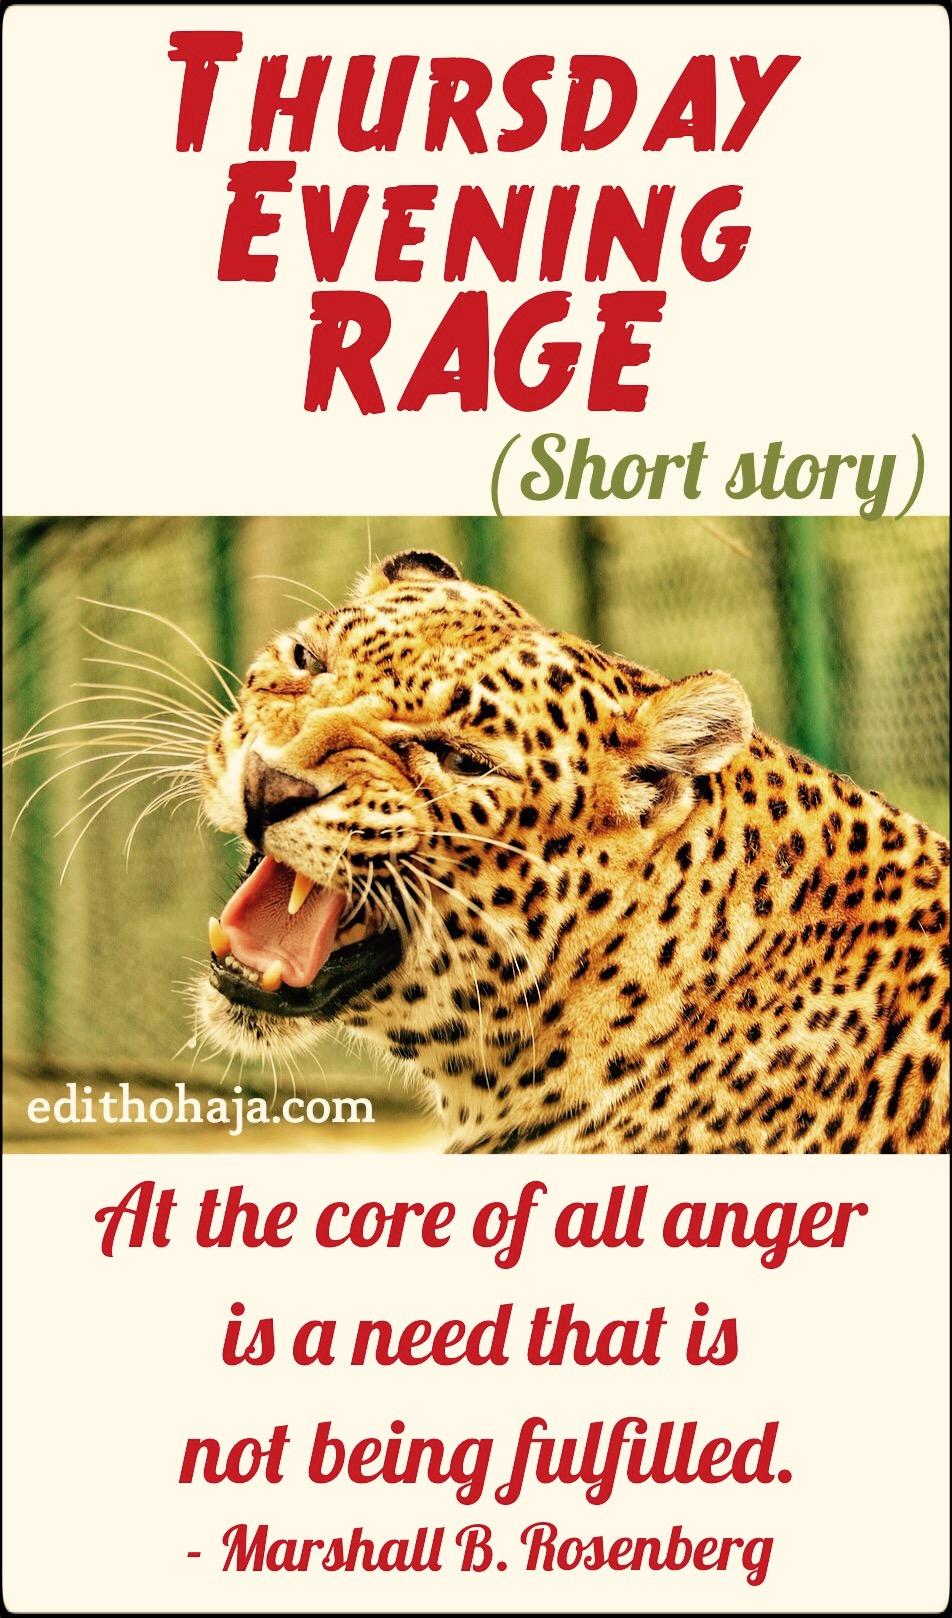 THURSDAY EVENING RAGE (SHORT STORY)